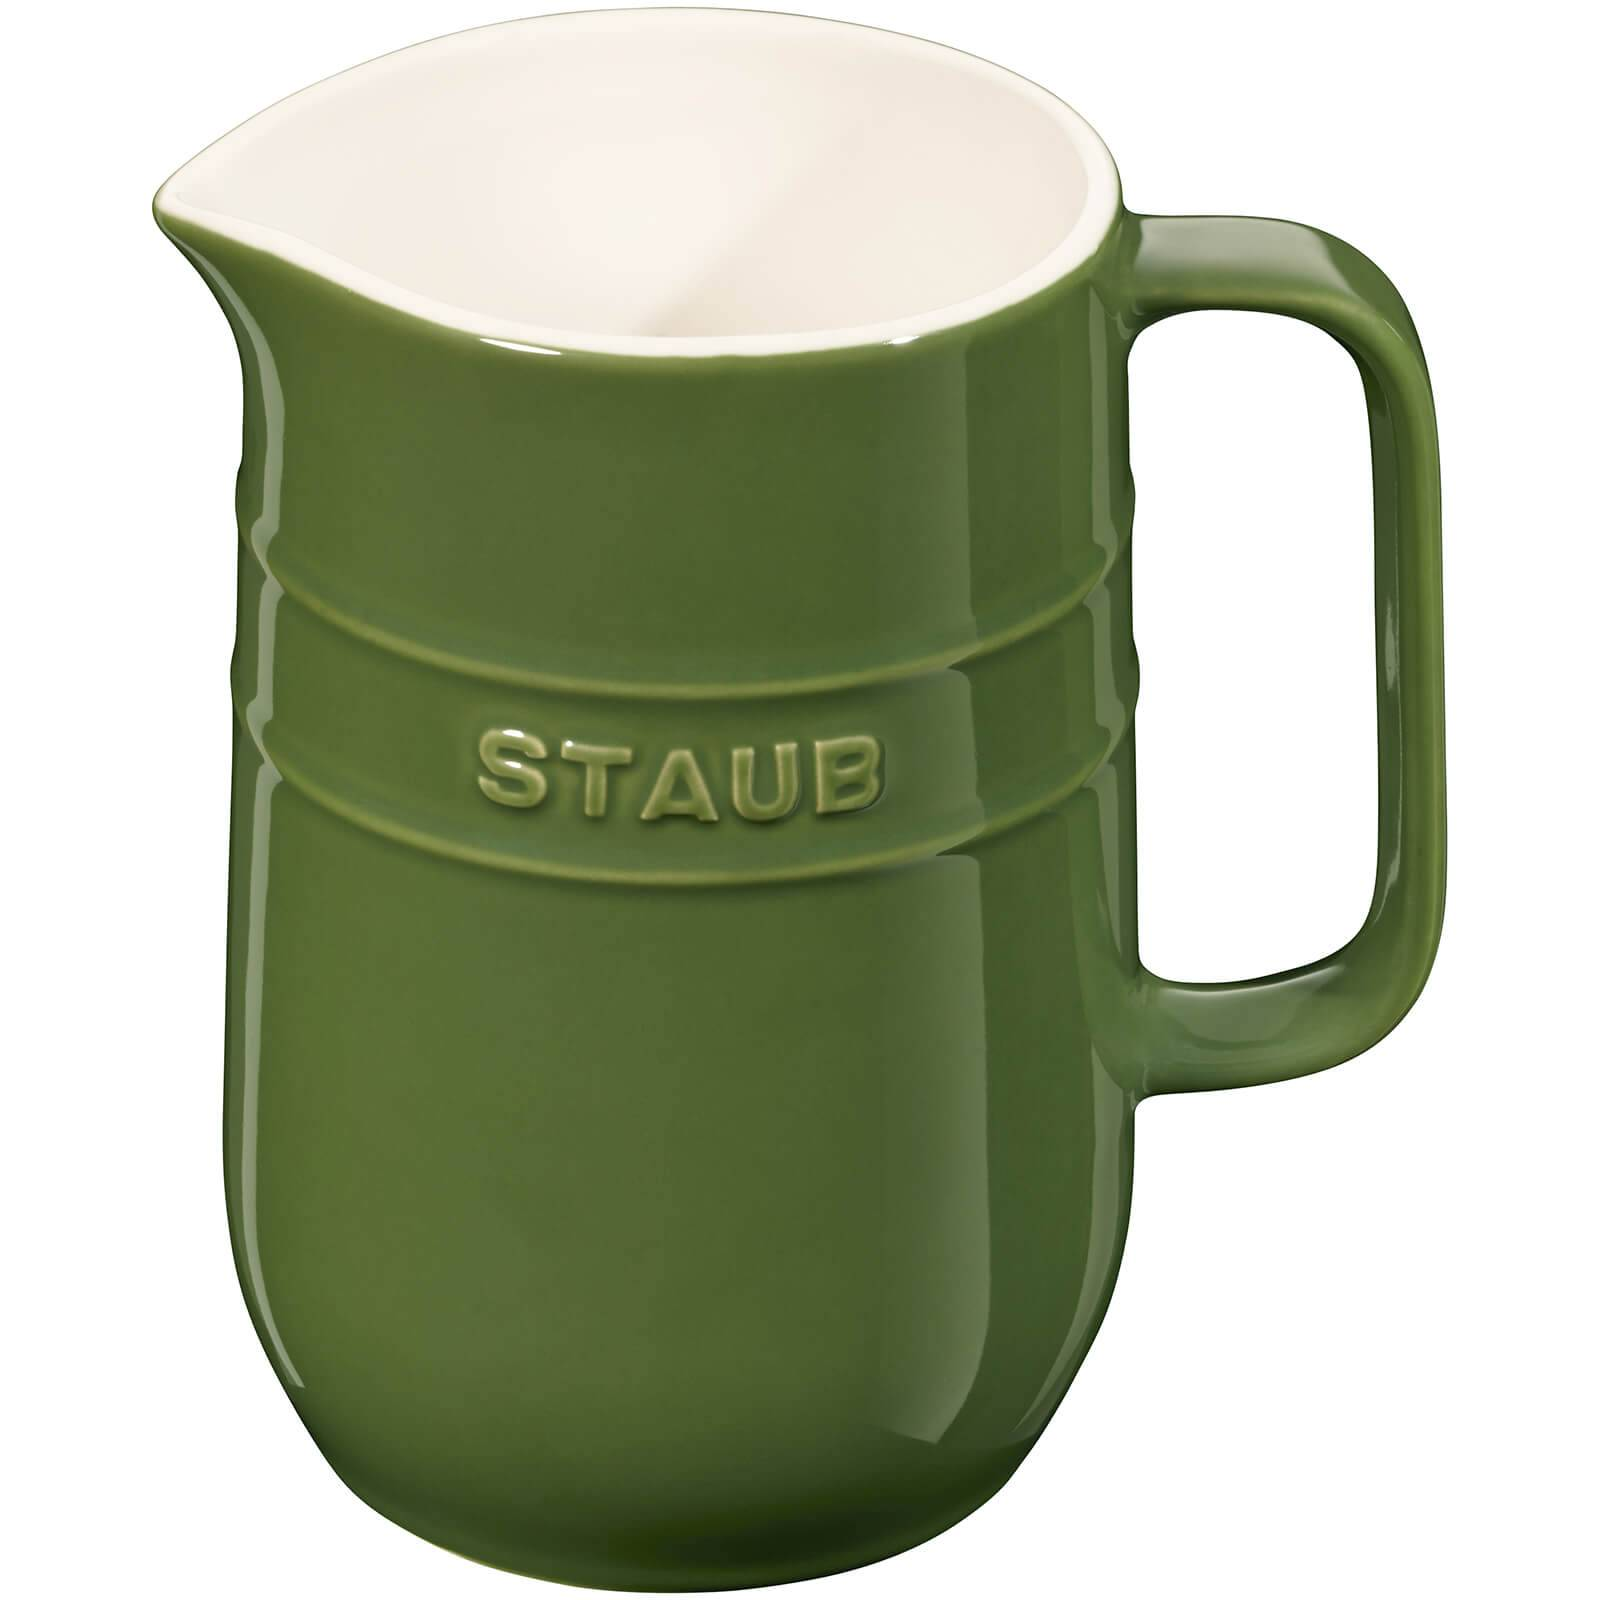 Staub Ceramic Round Pitcher - Basil